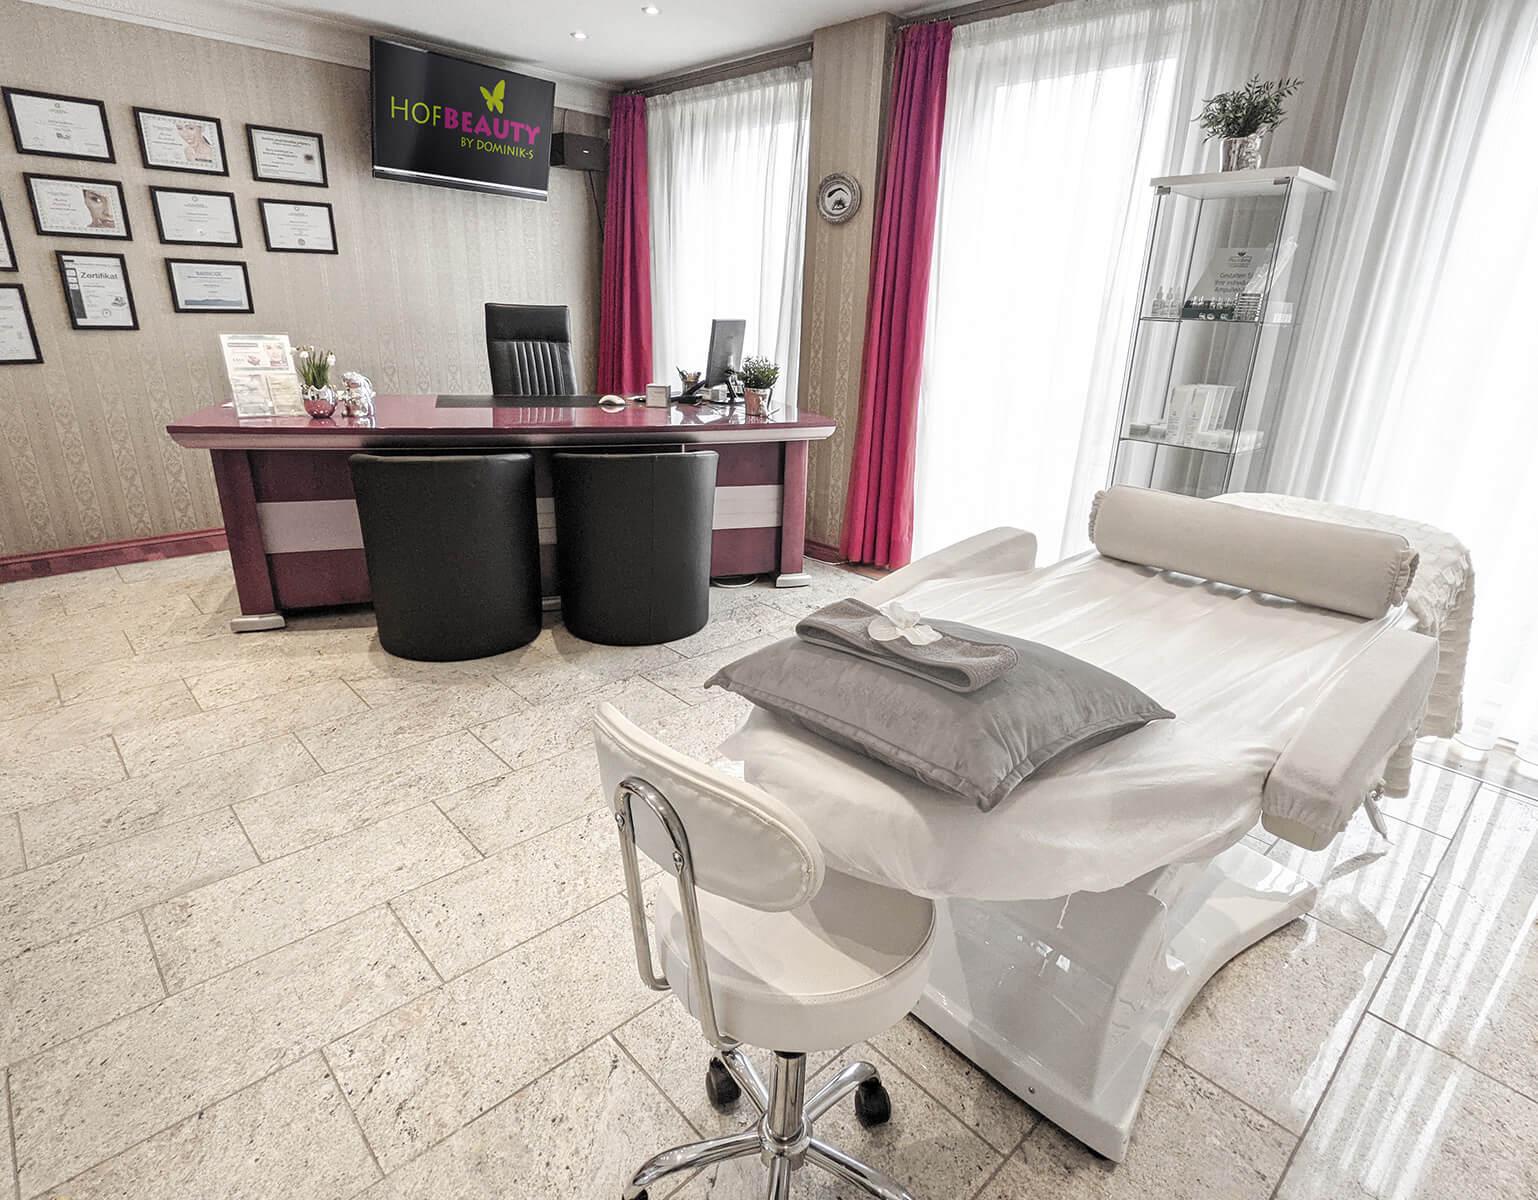 Kosmetikstudio HofBeauty - Behandlungsraum 02